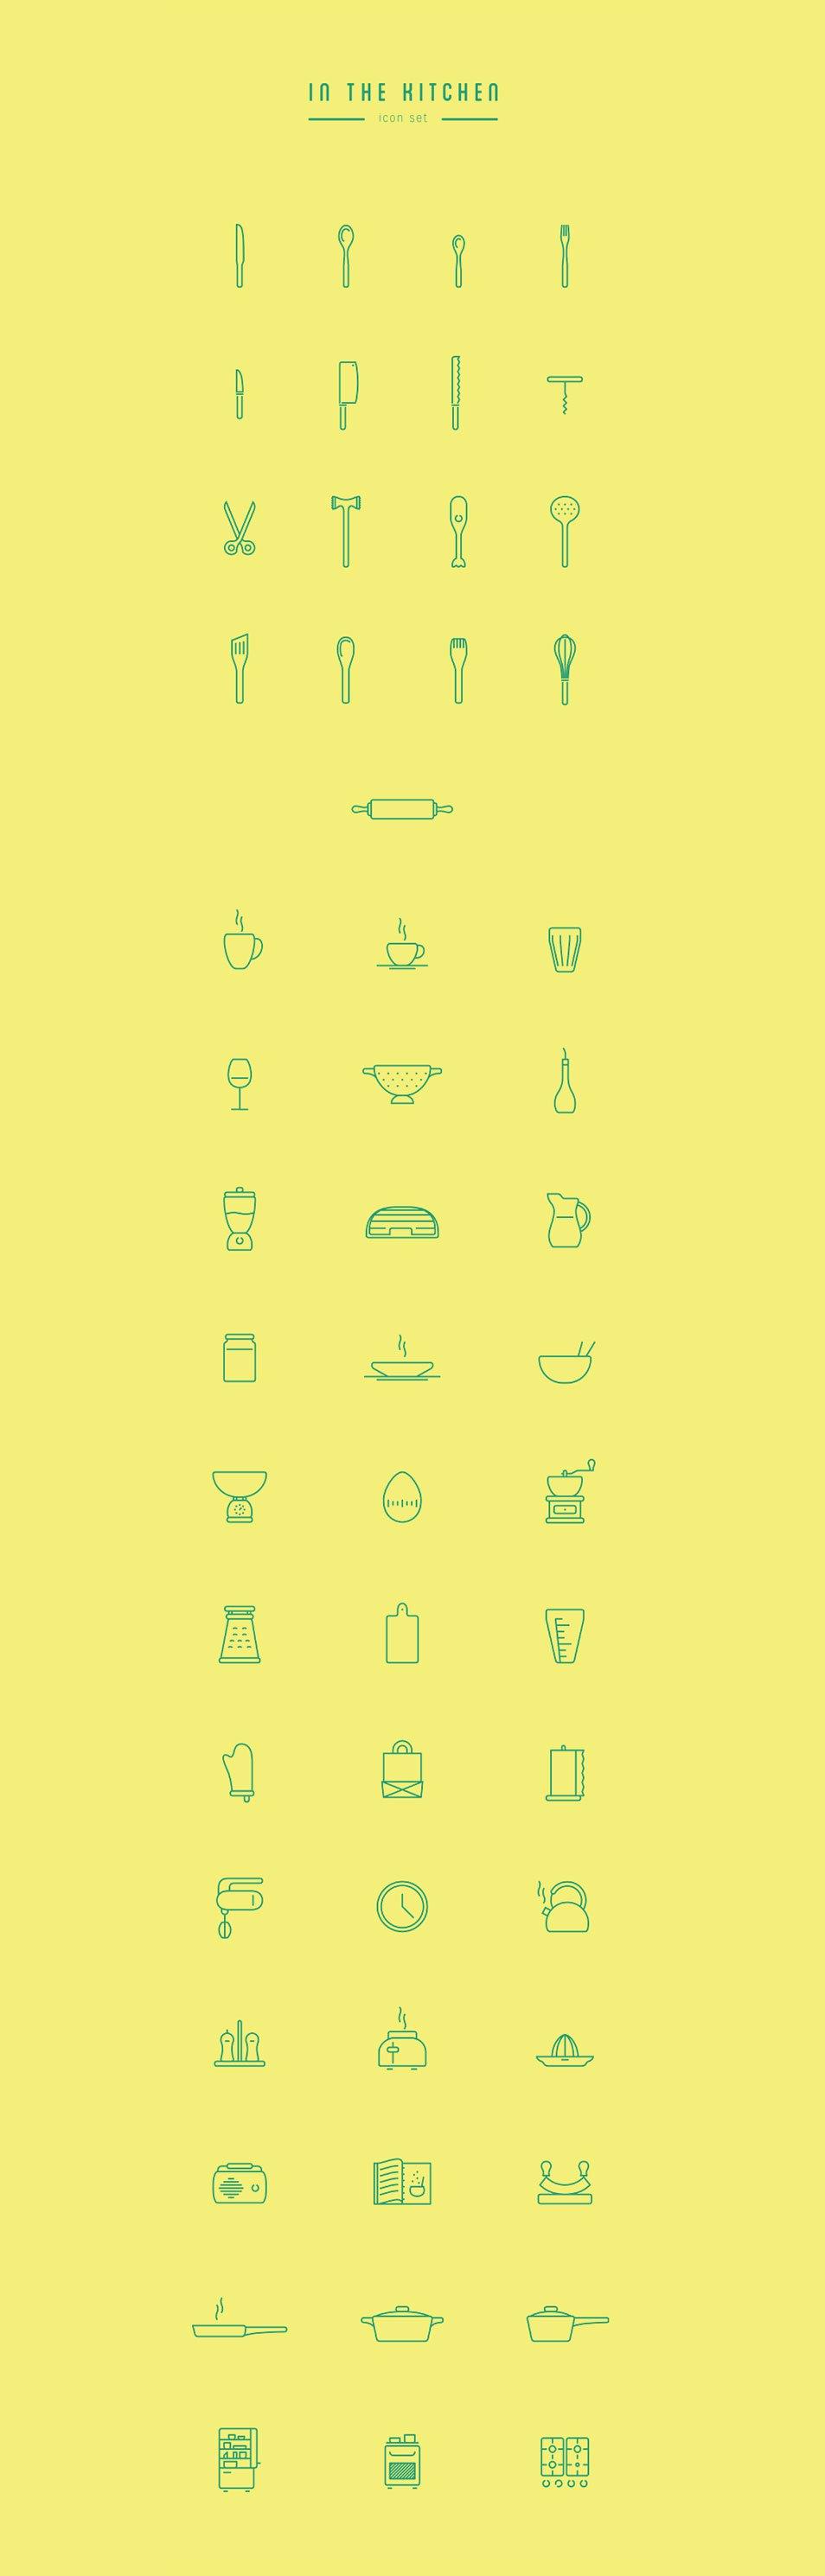 In The Kitchen – Free Icon Set